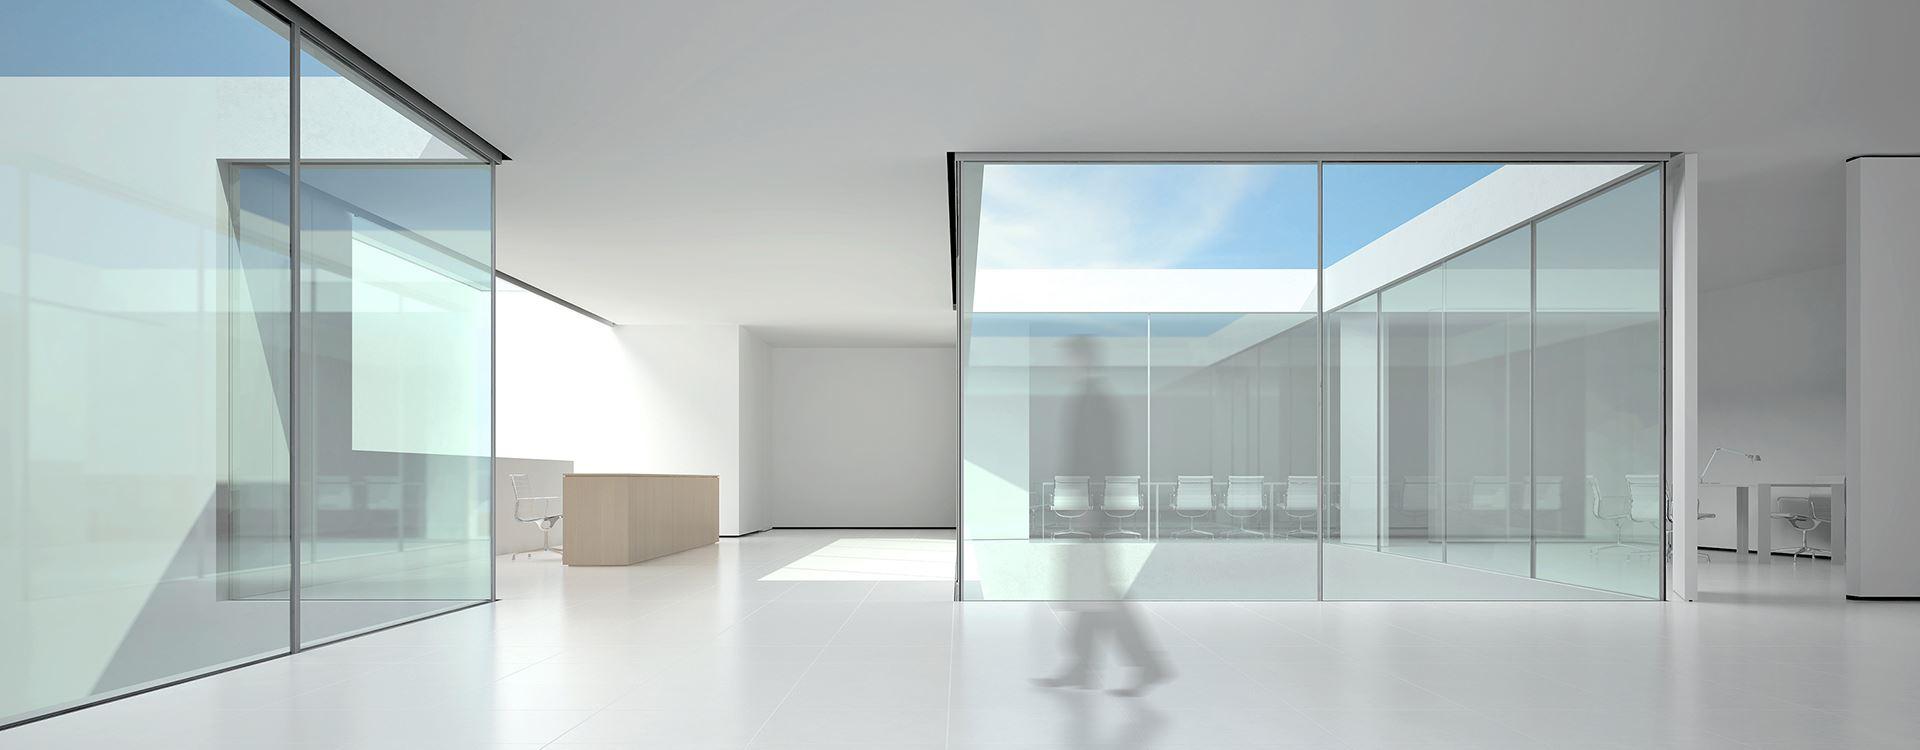 Fundacion Arquitectura Contemporanea